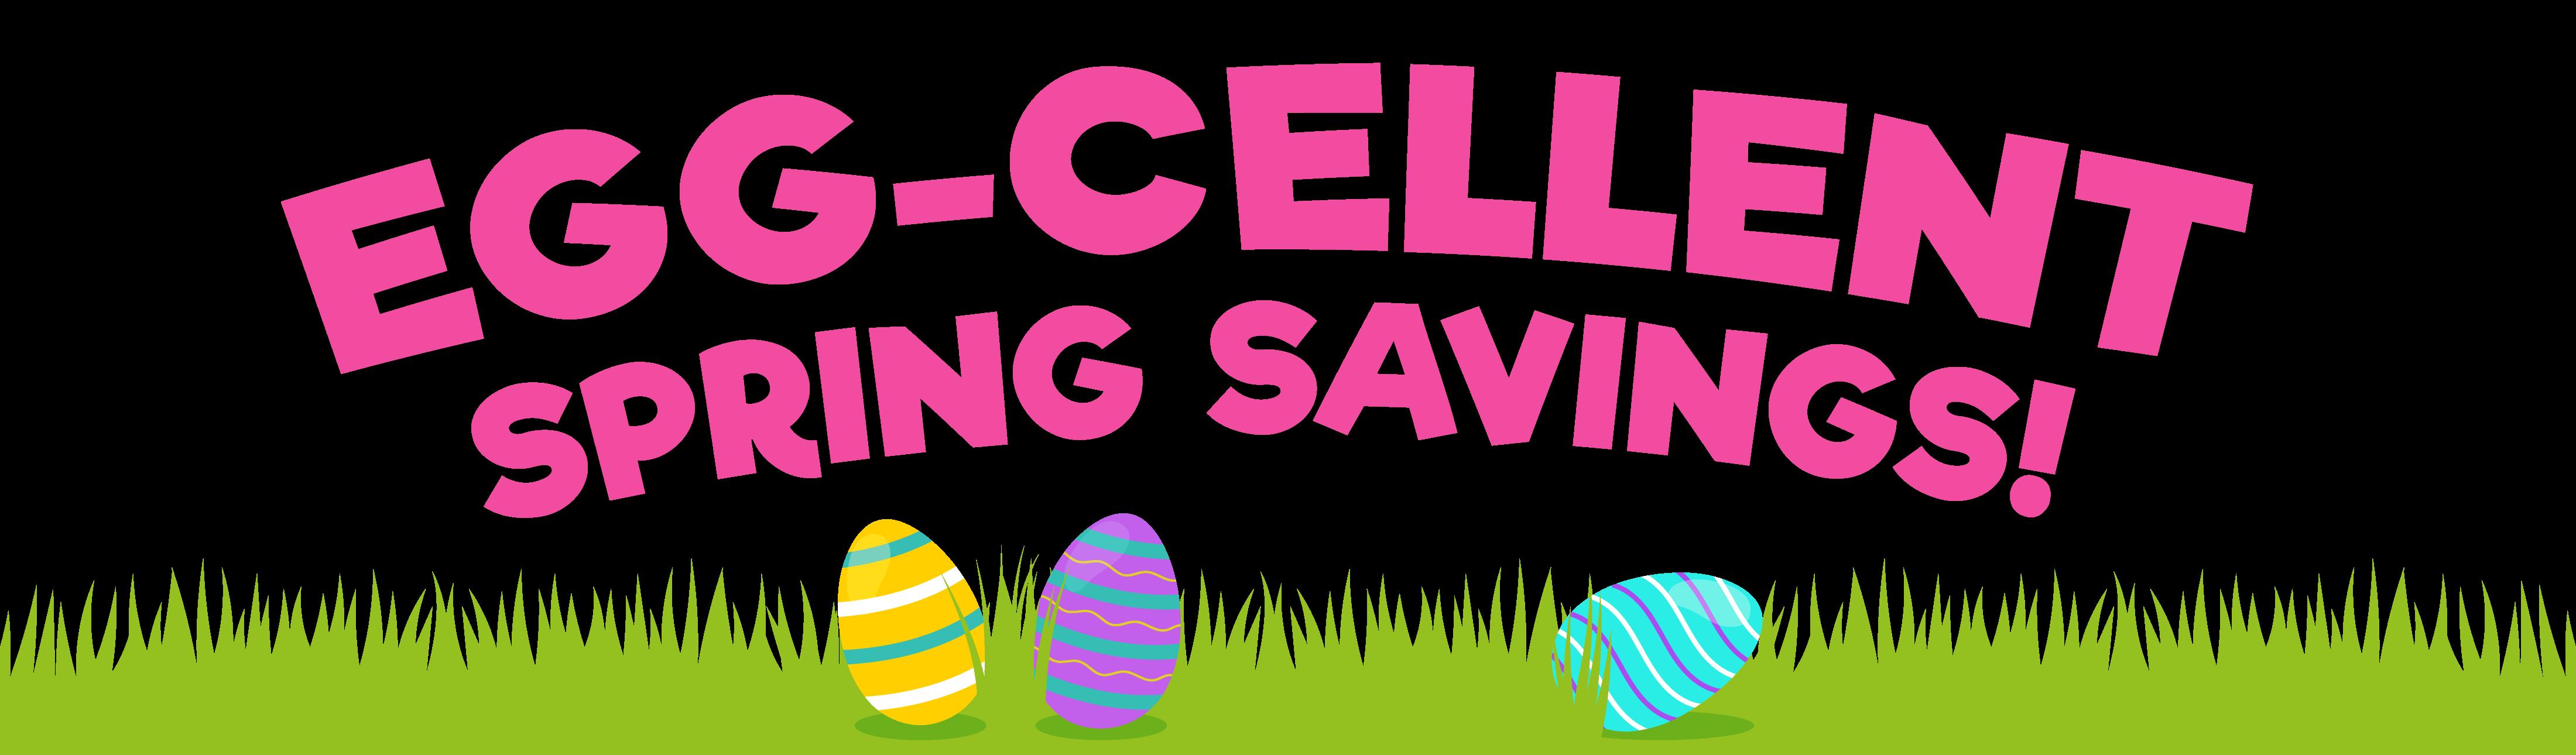 Egg-Cellent Spring Savings!